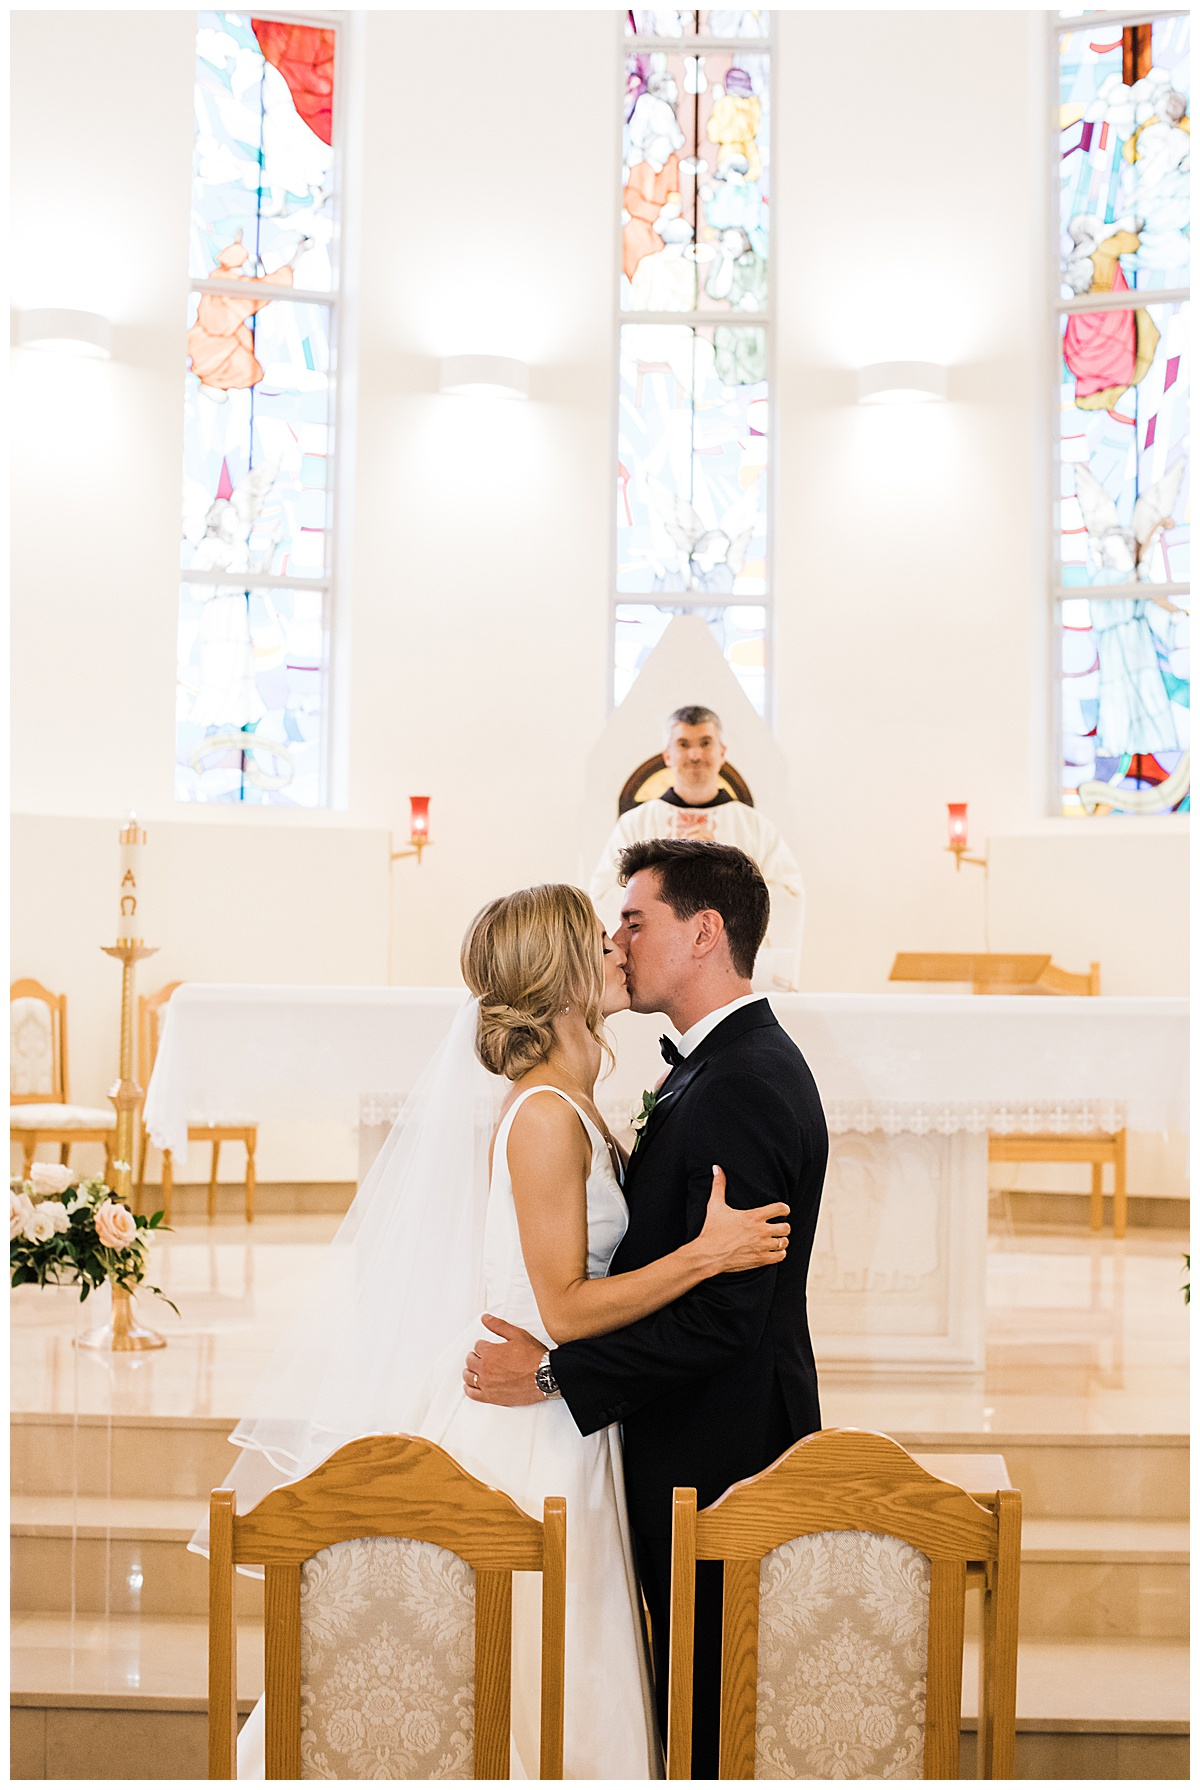 You may kiss the bride  Bride and groom first kiss  Ontario wedding  Toronto wedding photographer  3photography